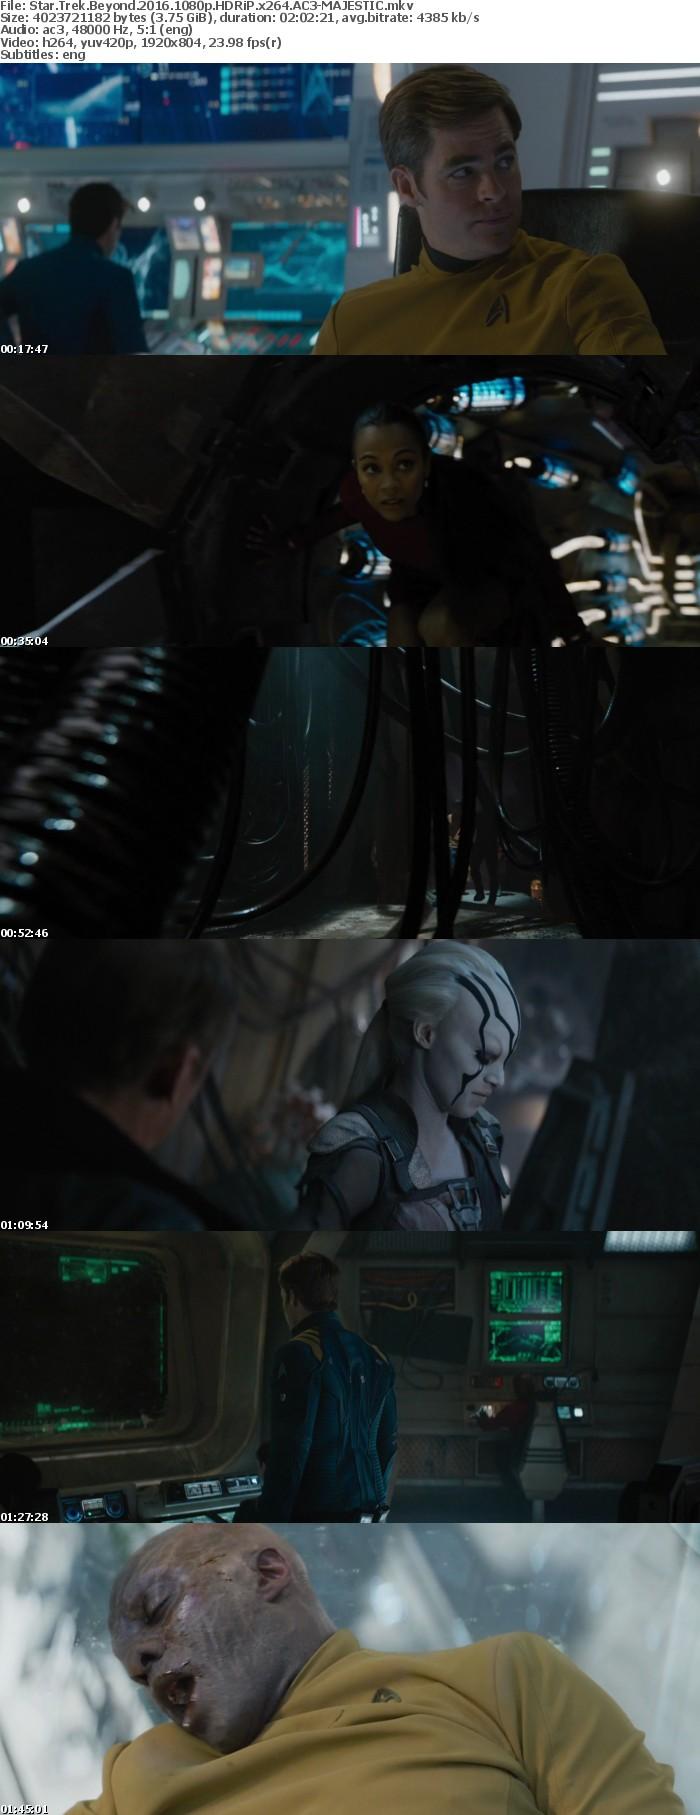 Star Trek Beyond 2016 1080p HDRiP x264 AC3-MAJESTIC